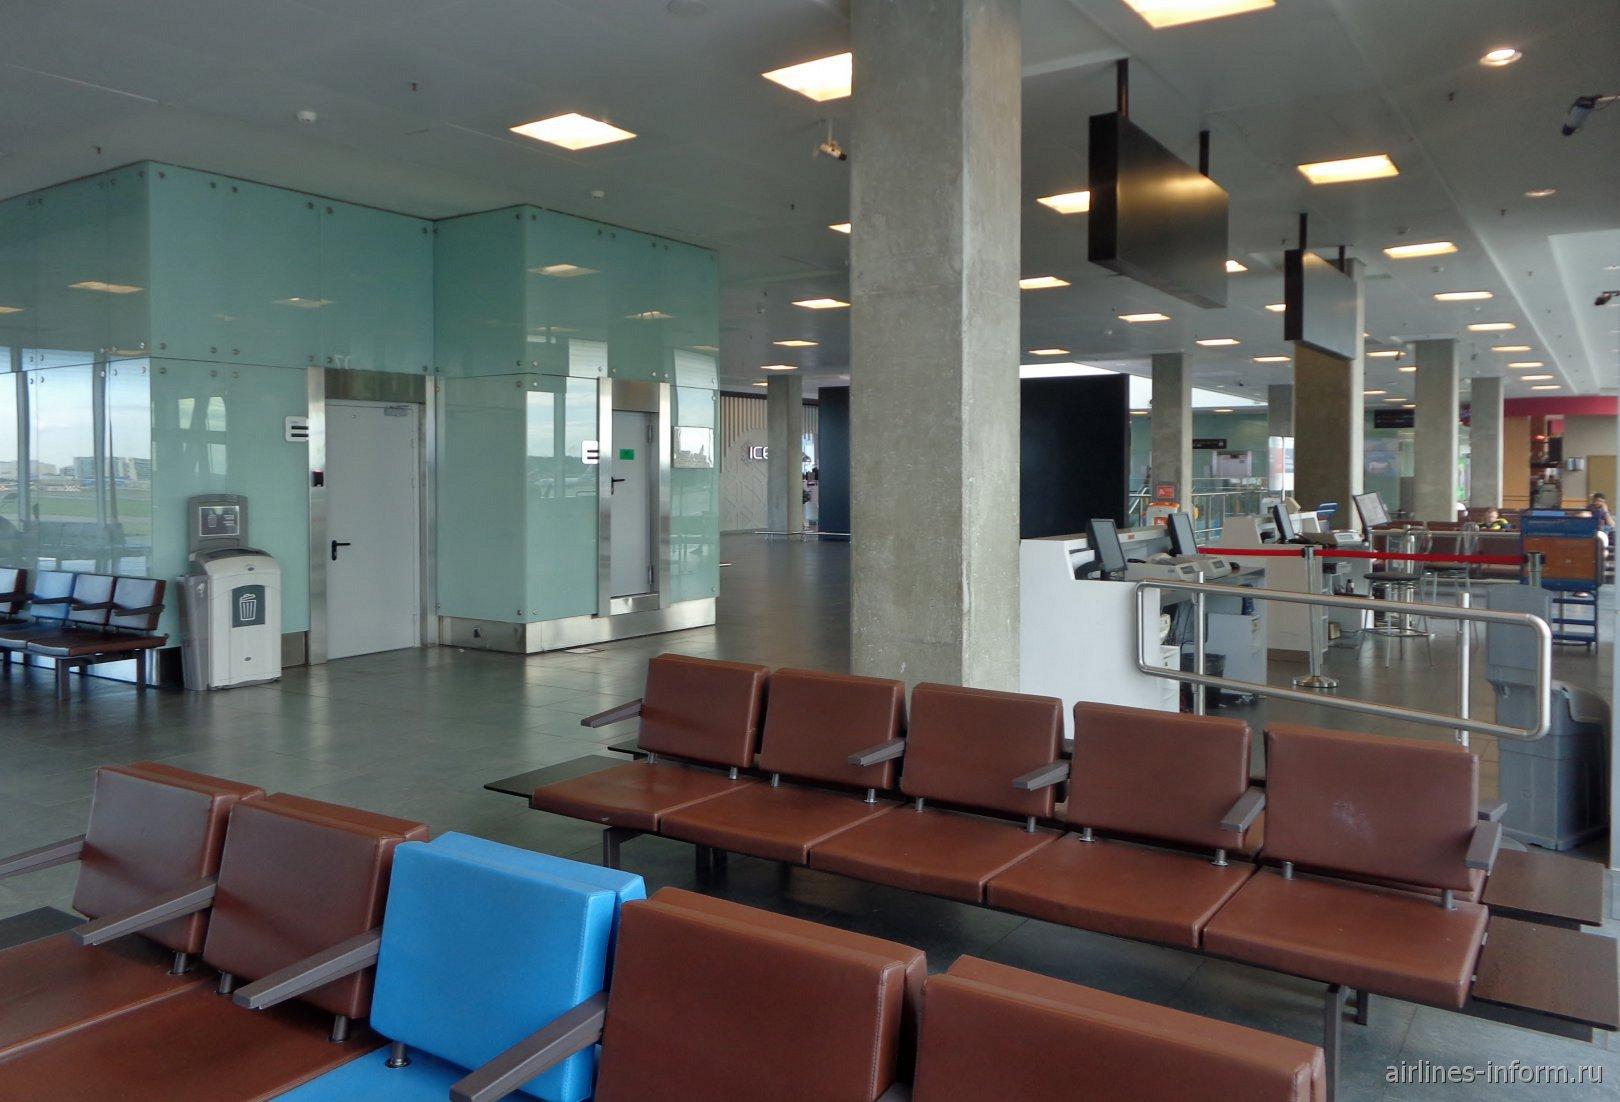 Выходы на посадку в аэропорту Санкт-Петербург Пулково